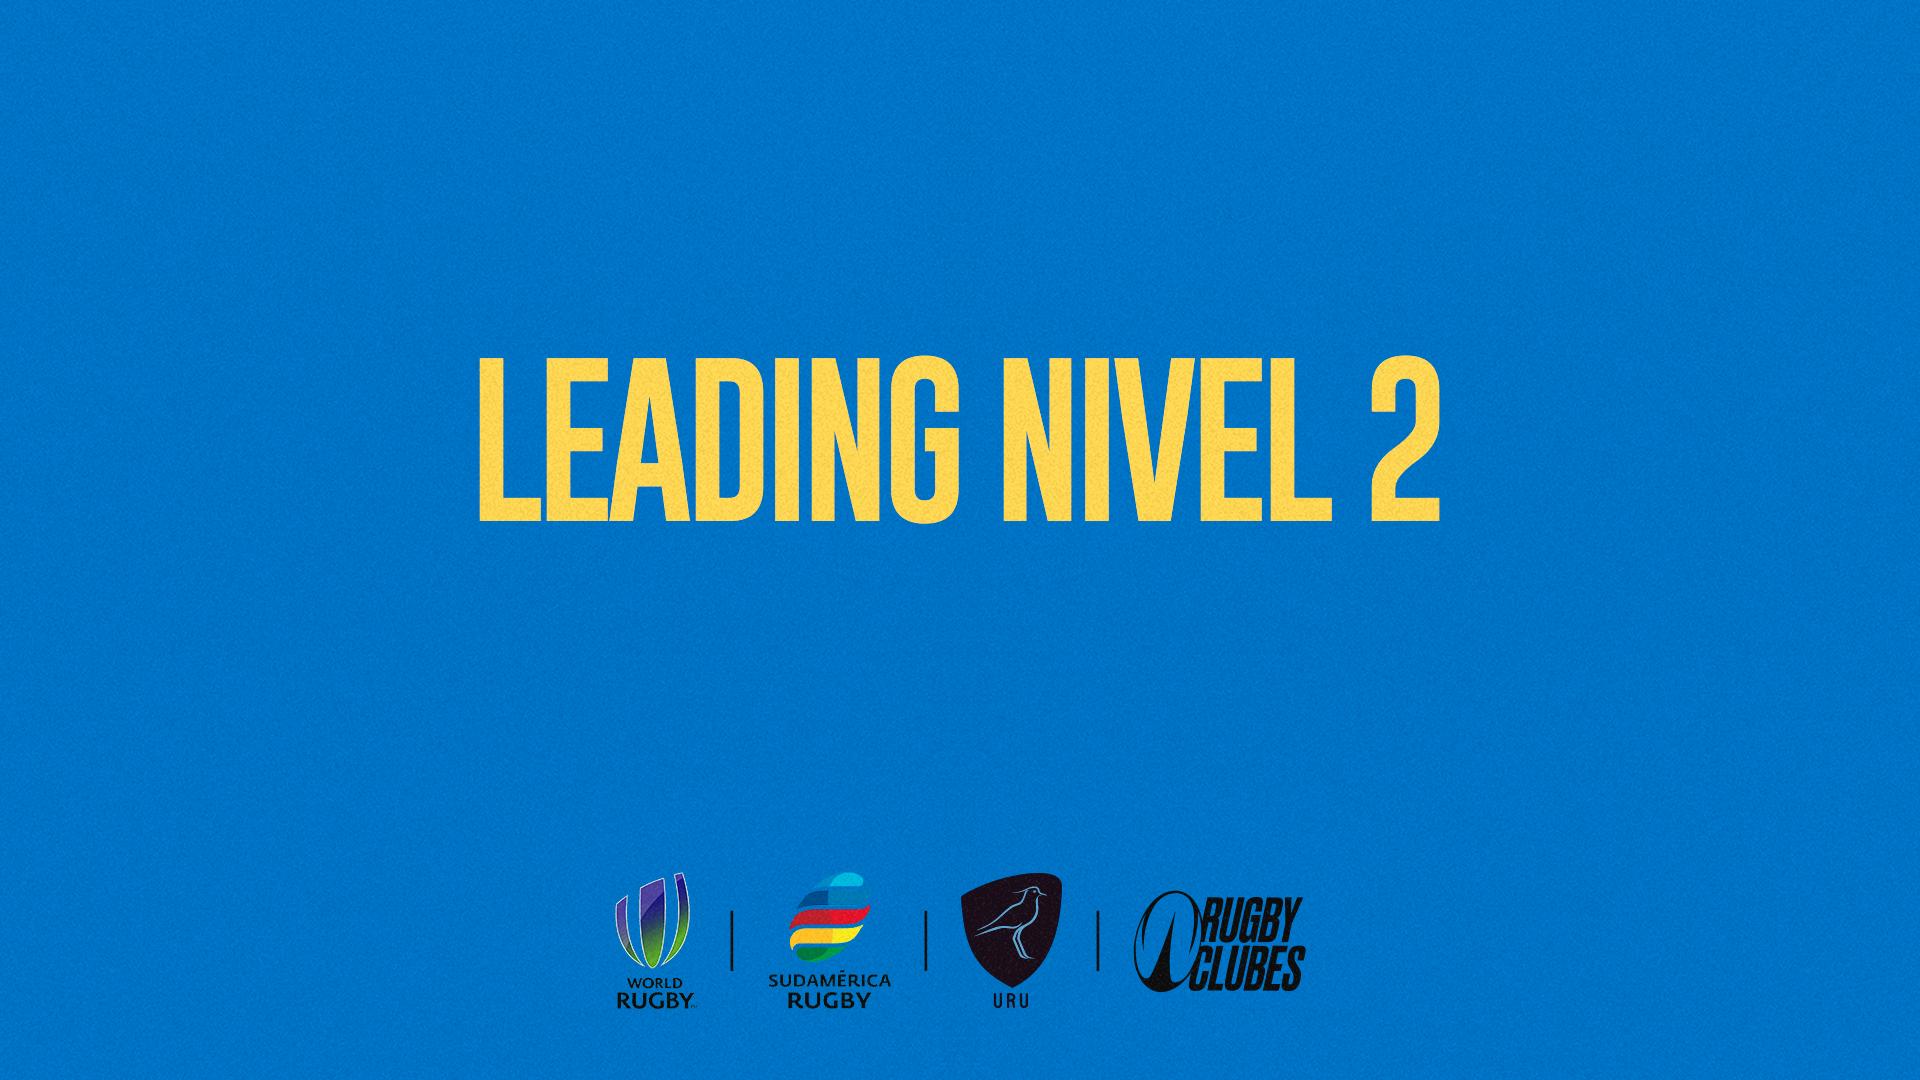 leading nivel 2